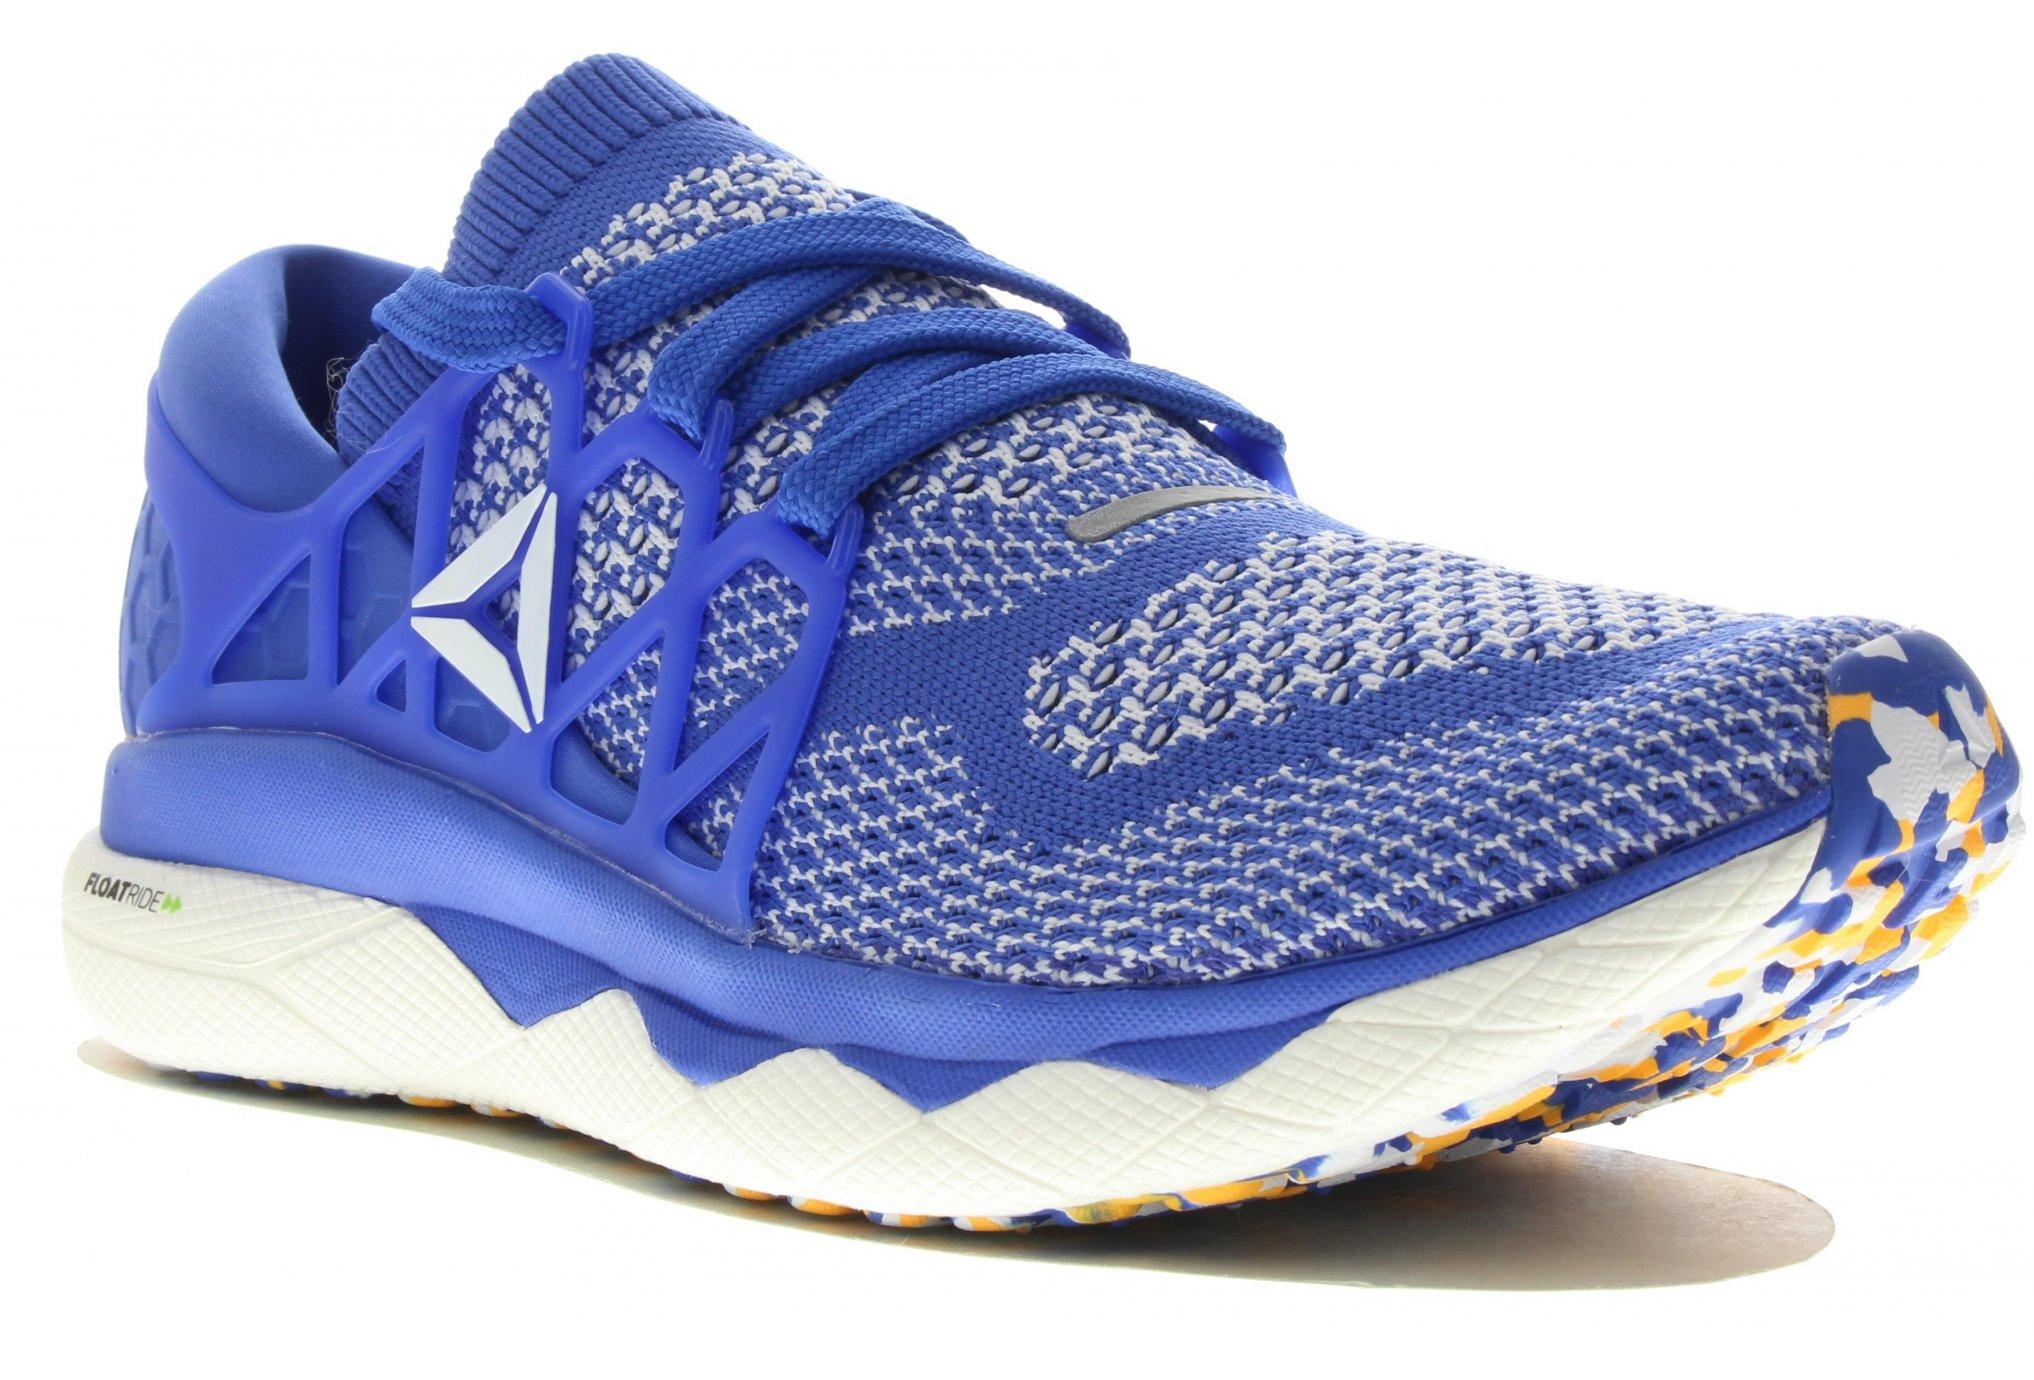 Reebok Floatride Run Ultraknit M Chaussures homme